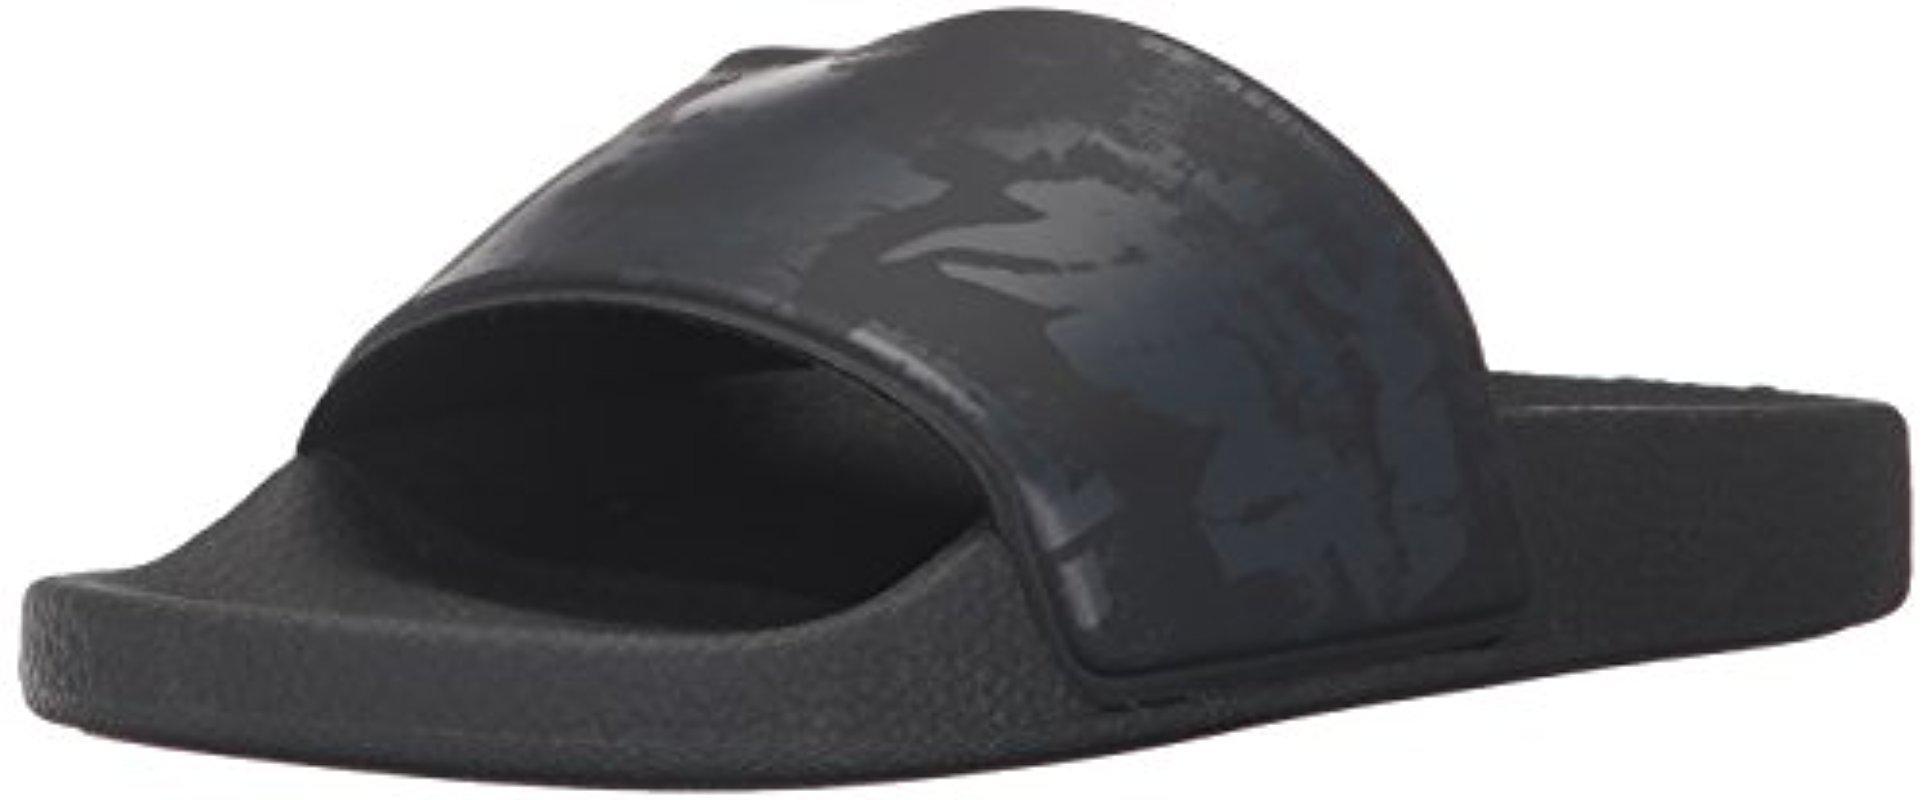 Men's a-Lohha SA-Maral Slide Sandal Black/Anthracite 9 M US